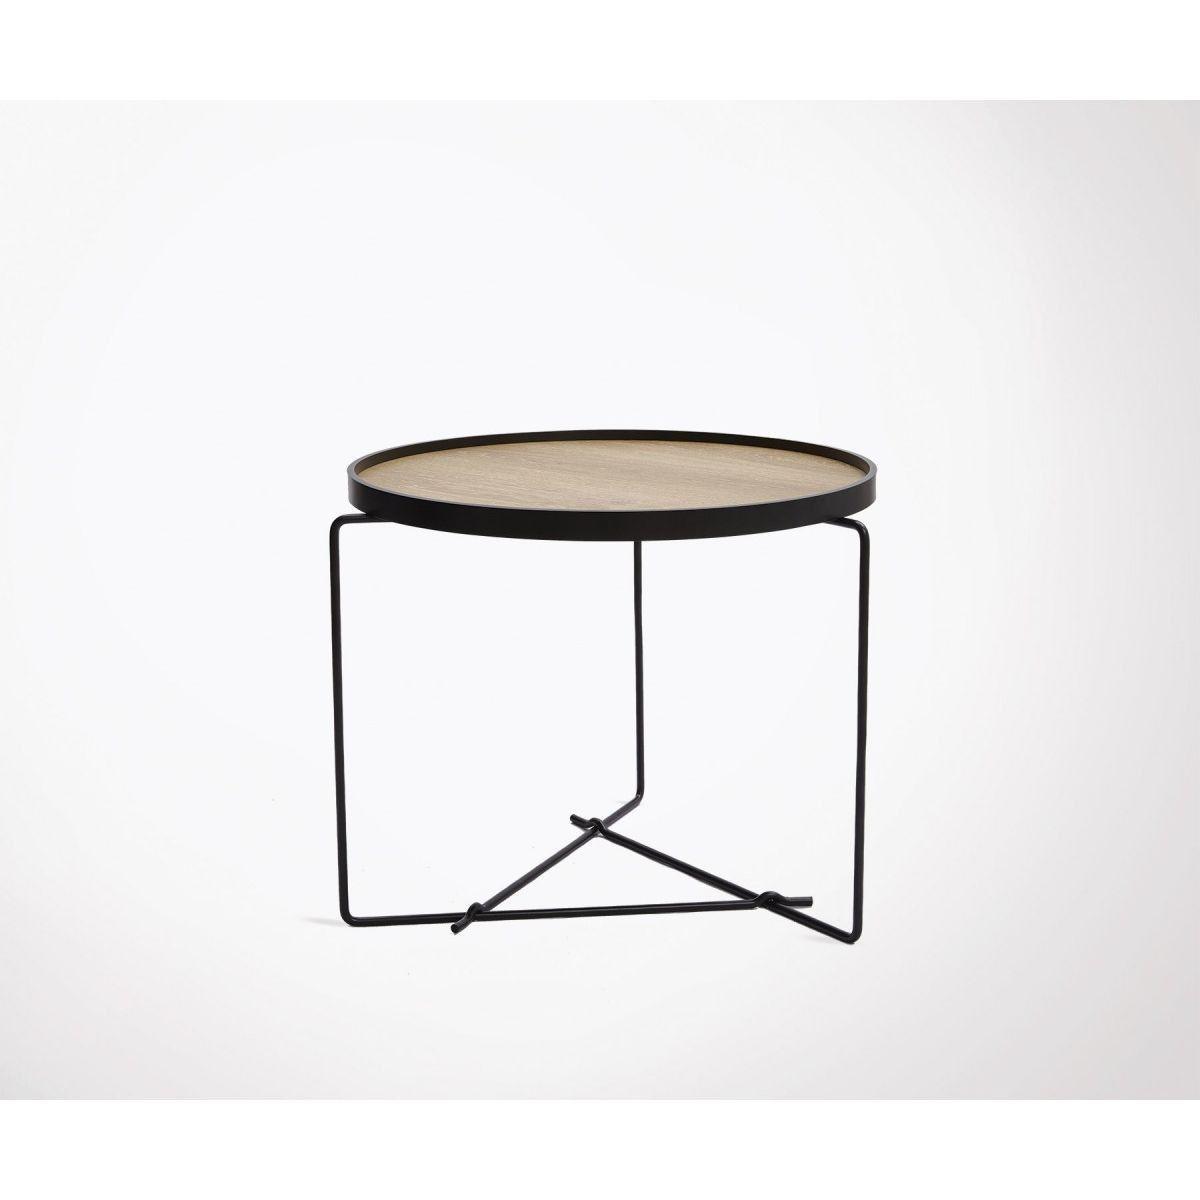 Petite Table Basse Design Bois Metal Winel Table Basse Design